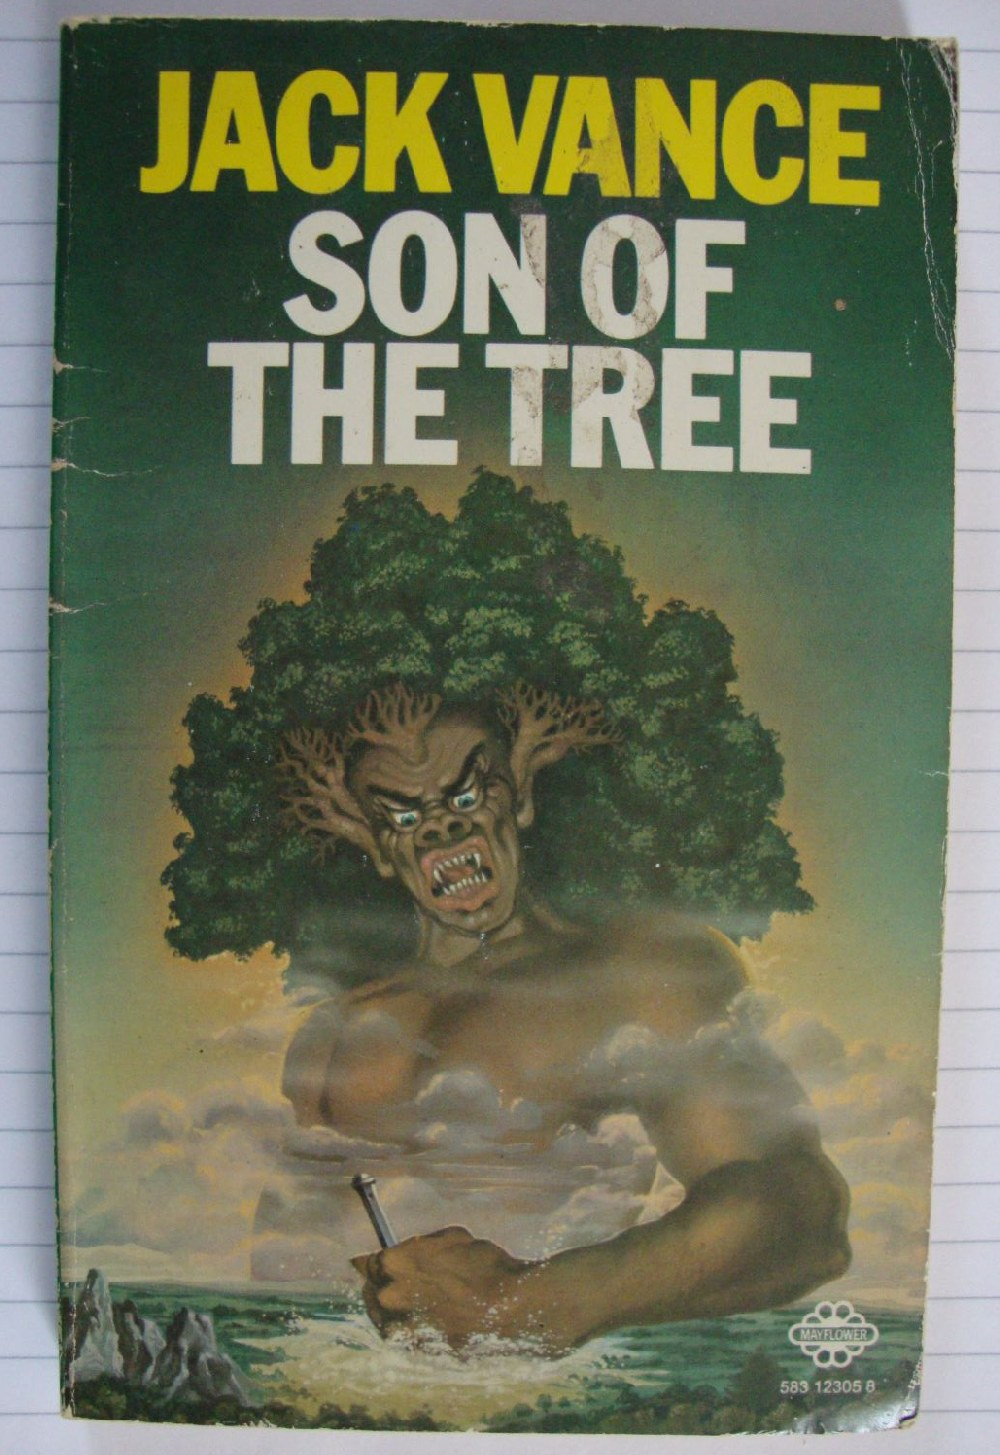 Son-of-a-birch